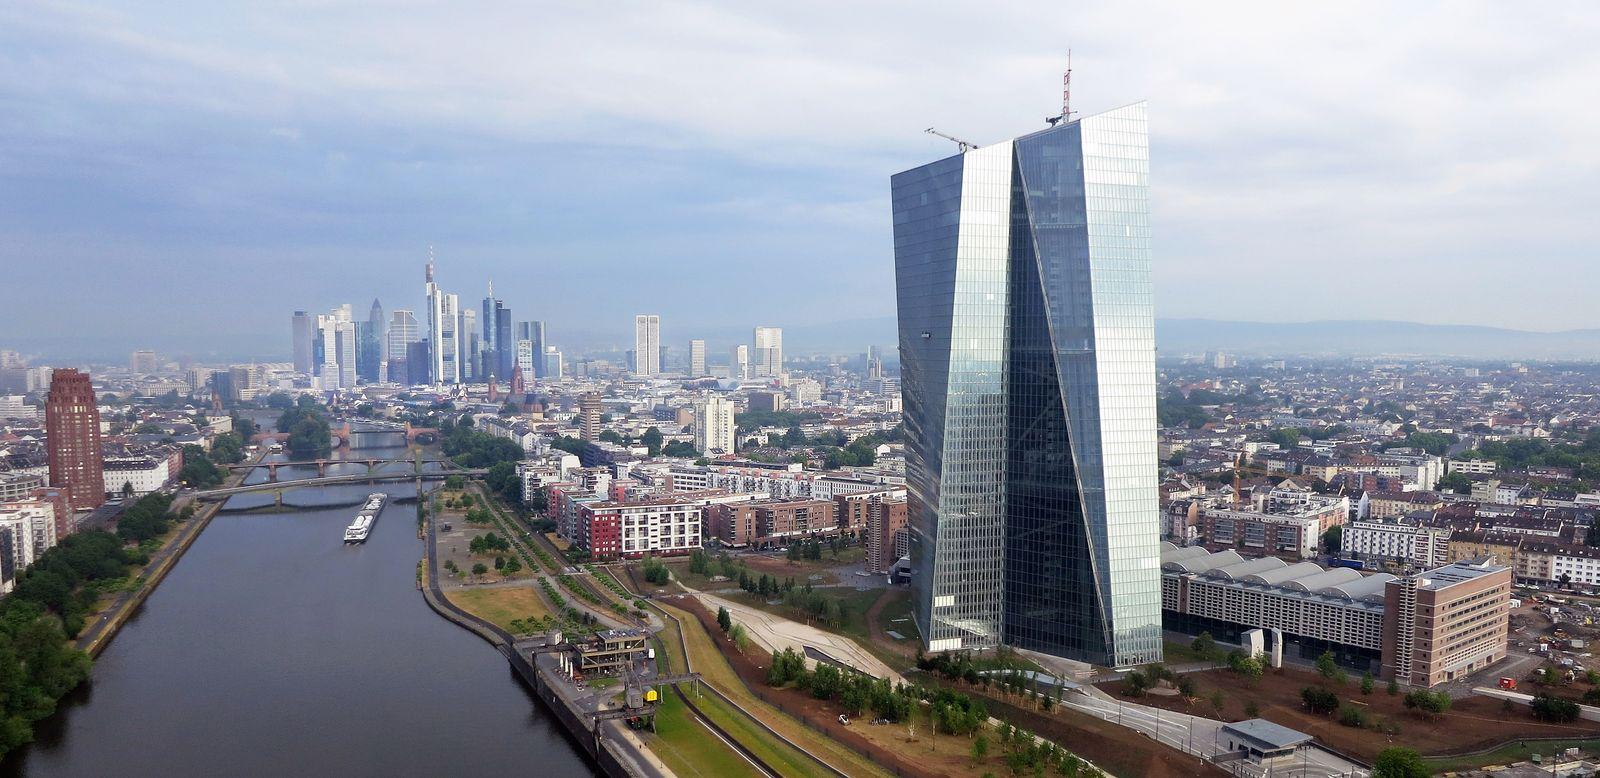 EZB Frankfurt Banken